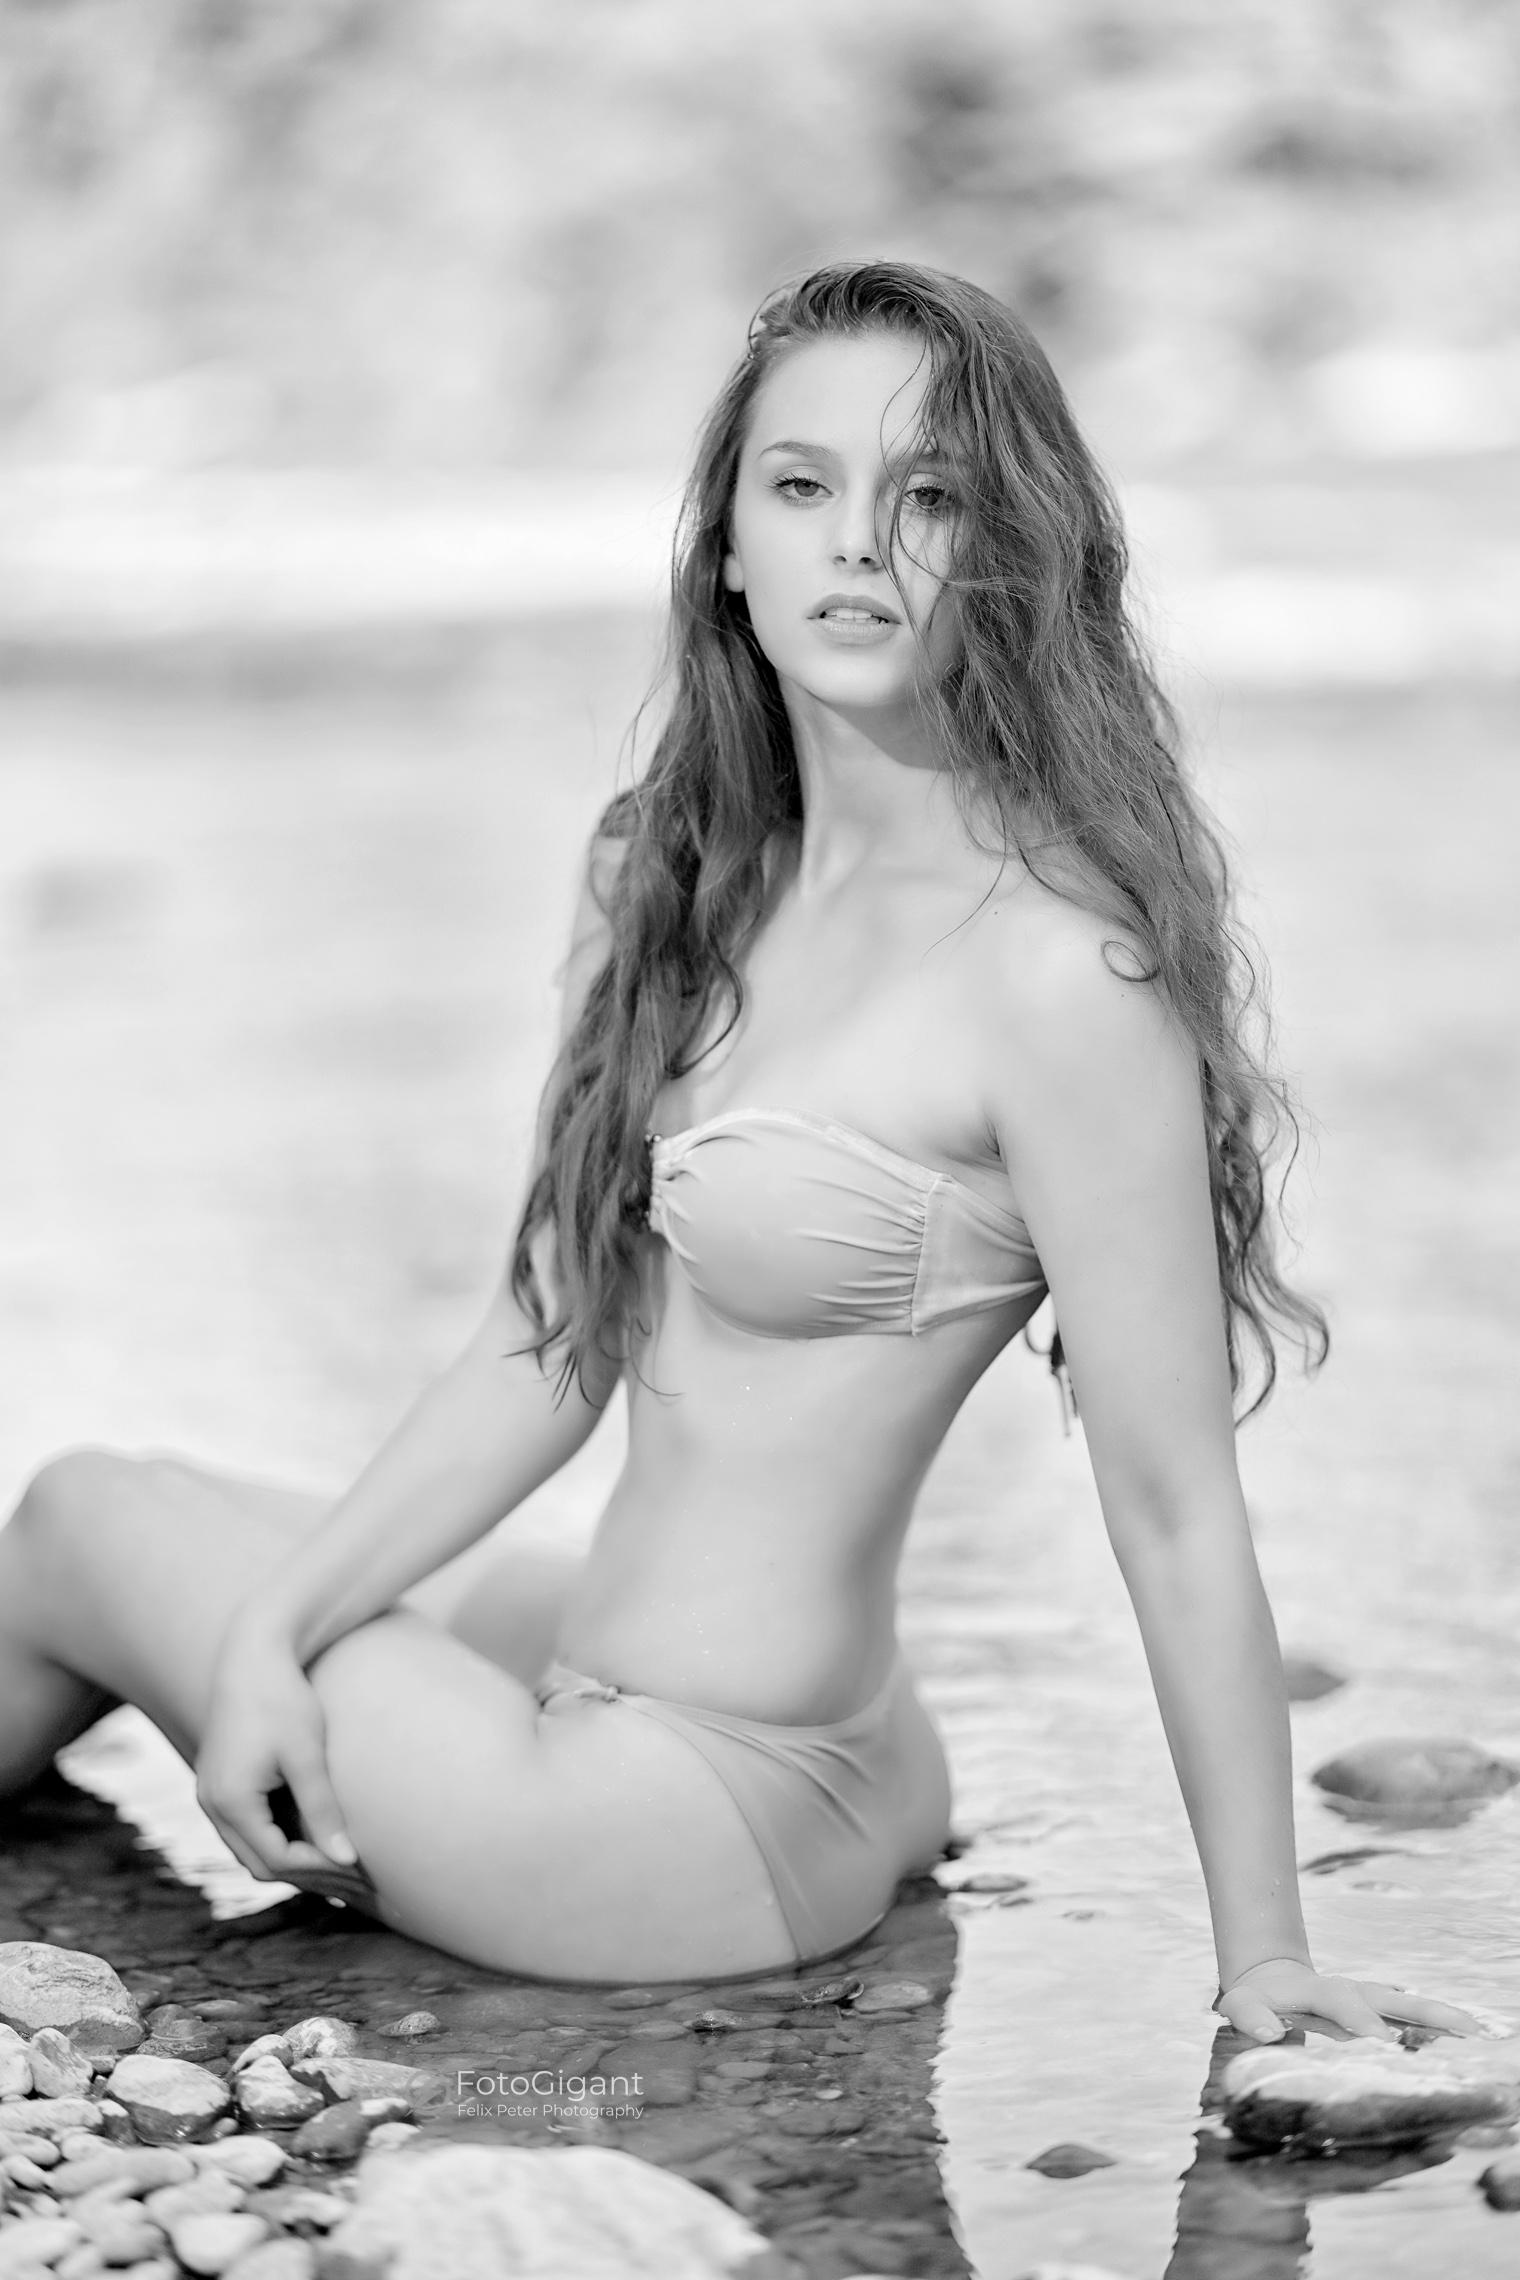 Bikini_Fashionphotography_FelixPeter_06.jpg